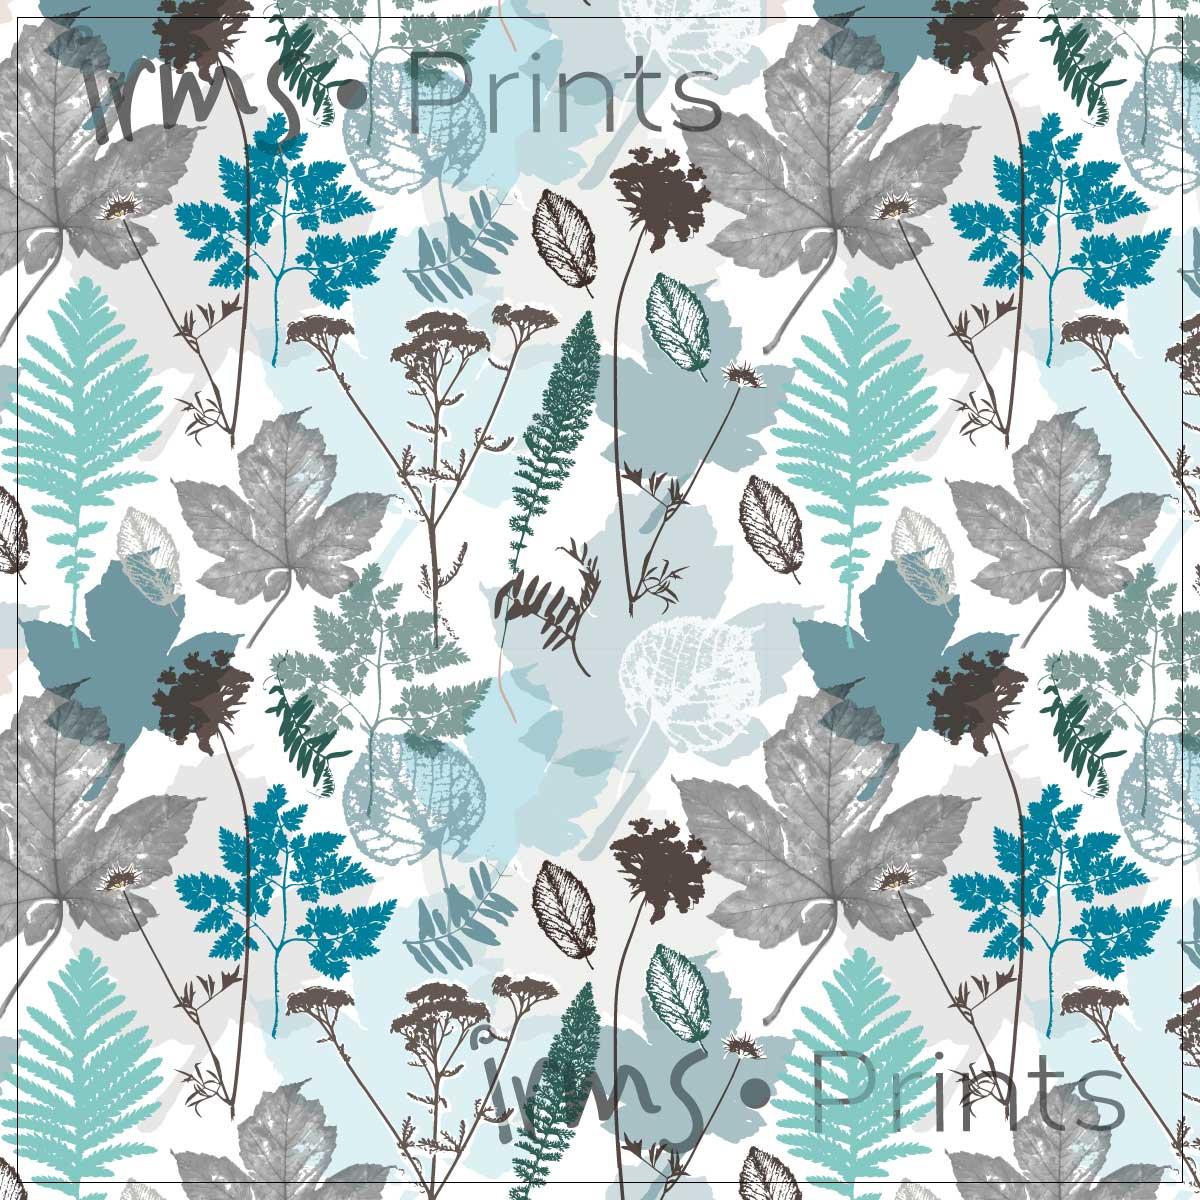 unieke-kleurkaart-print-natuur-irmsblog